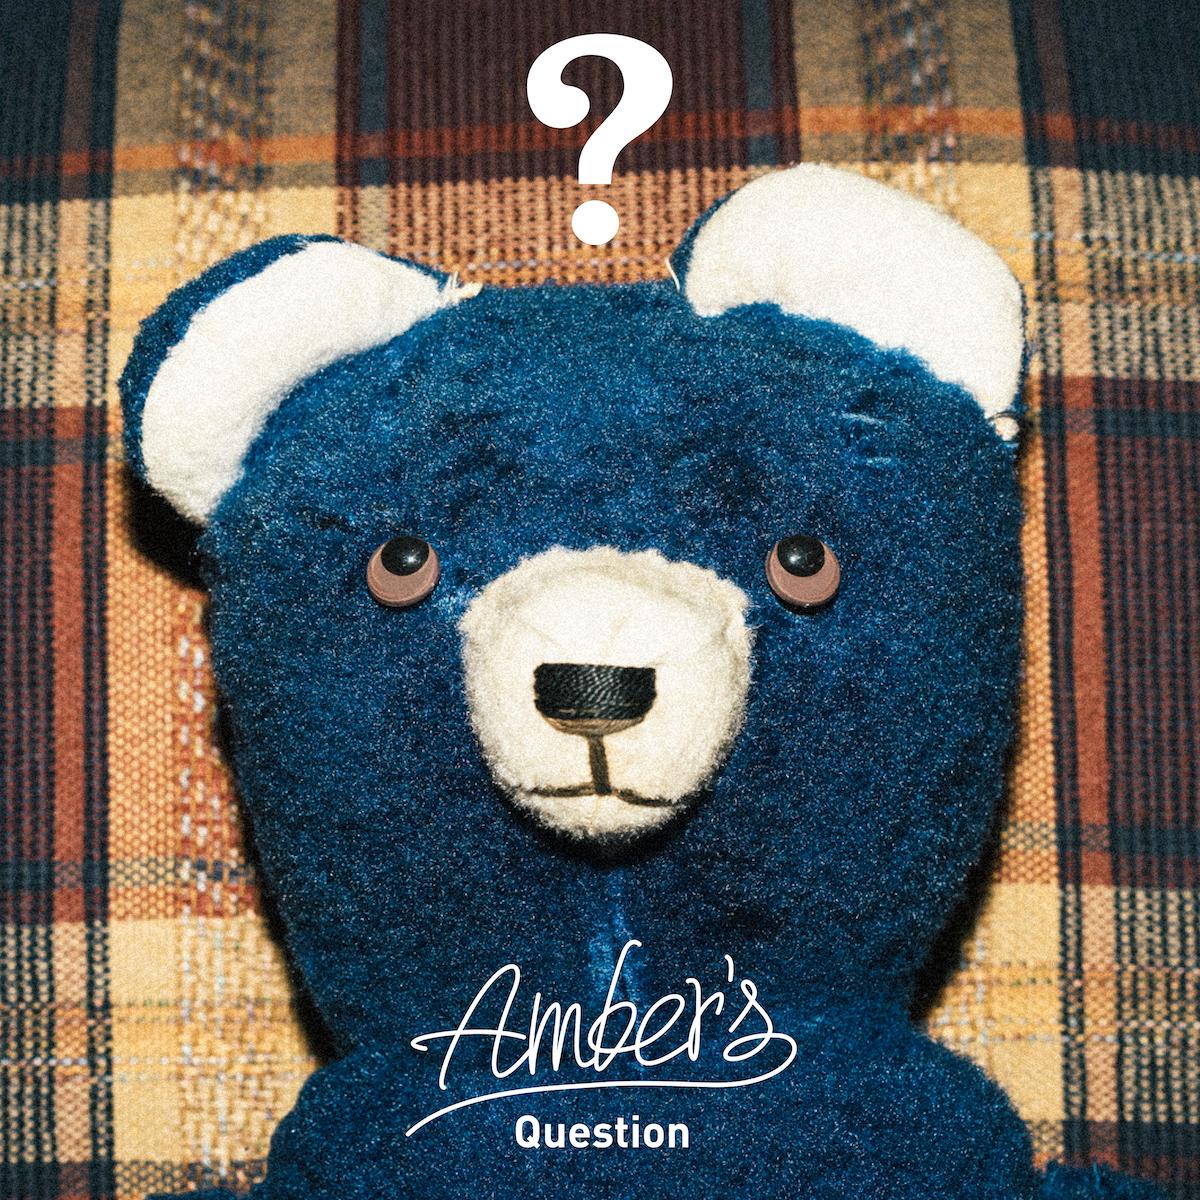 『Amber's - Question』収録の『Question』ジャケット